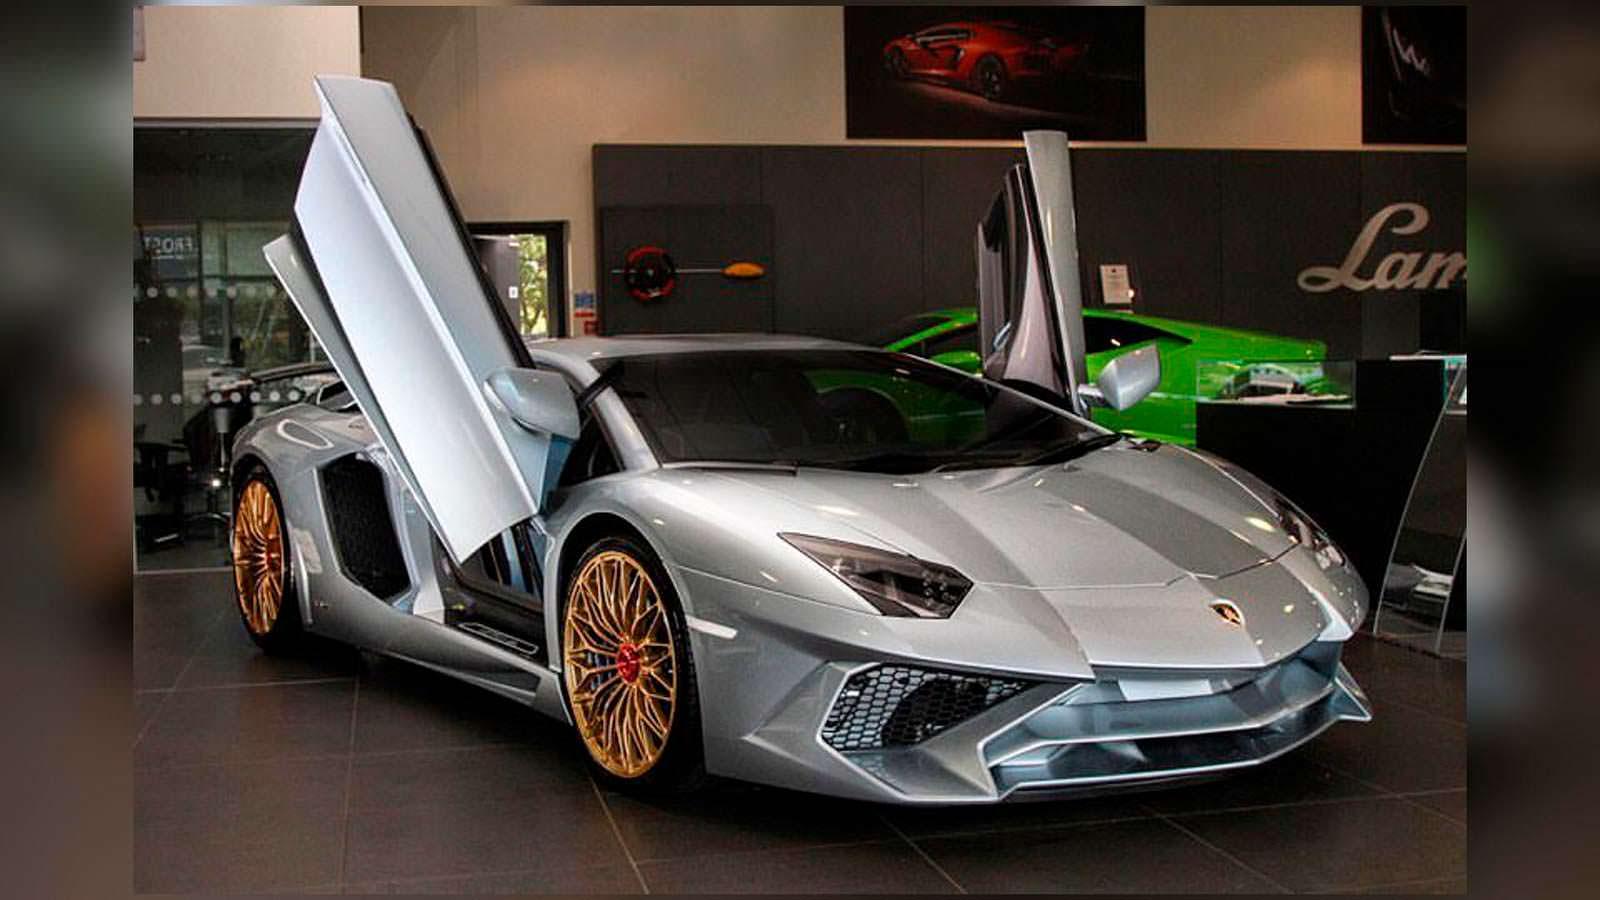 Последний экземпляр Lamborghini Aventador SV #600 из 600